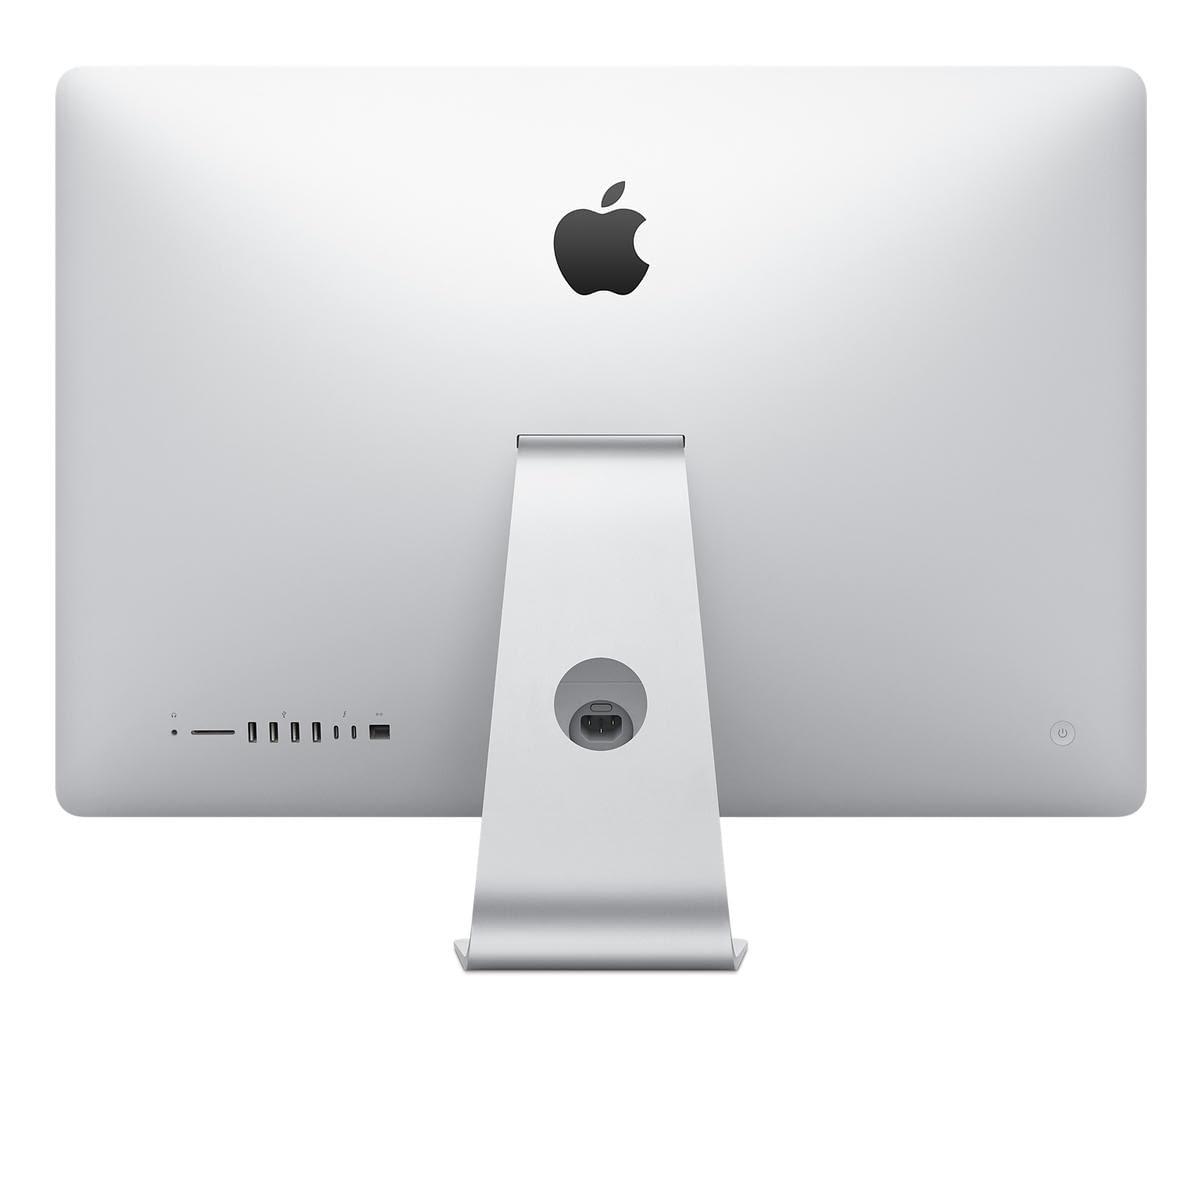 iMac reacondicionado -